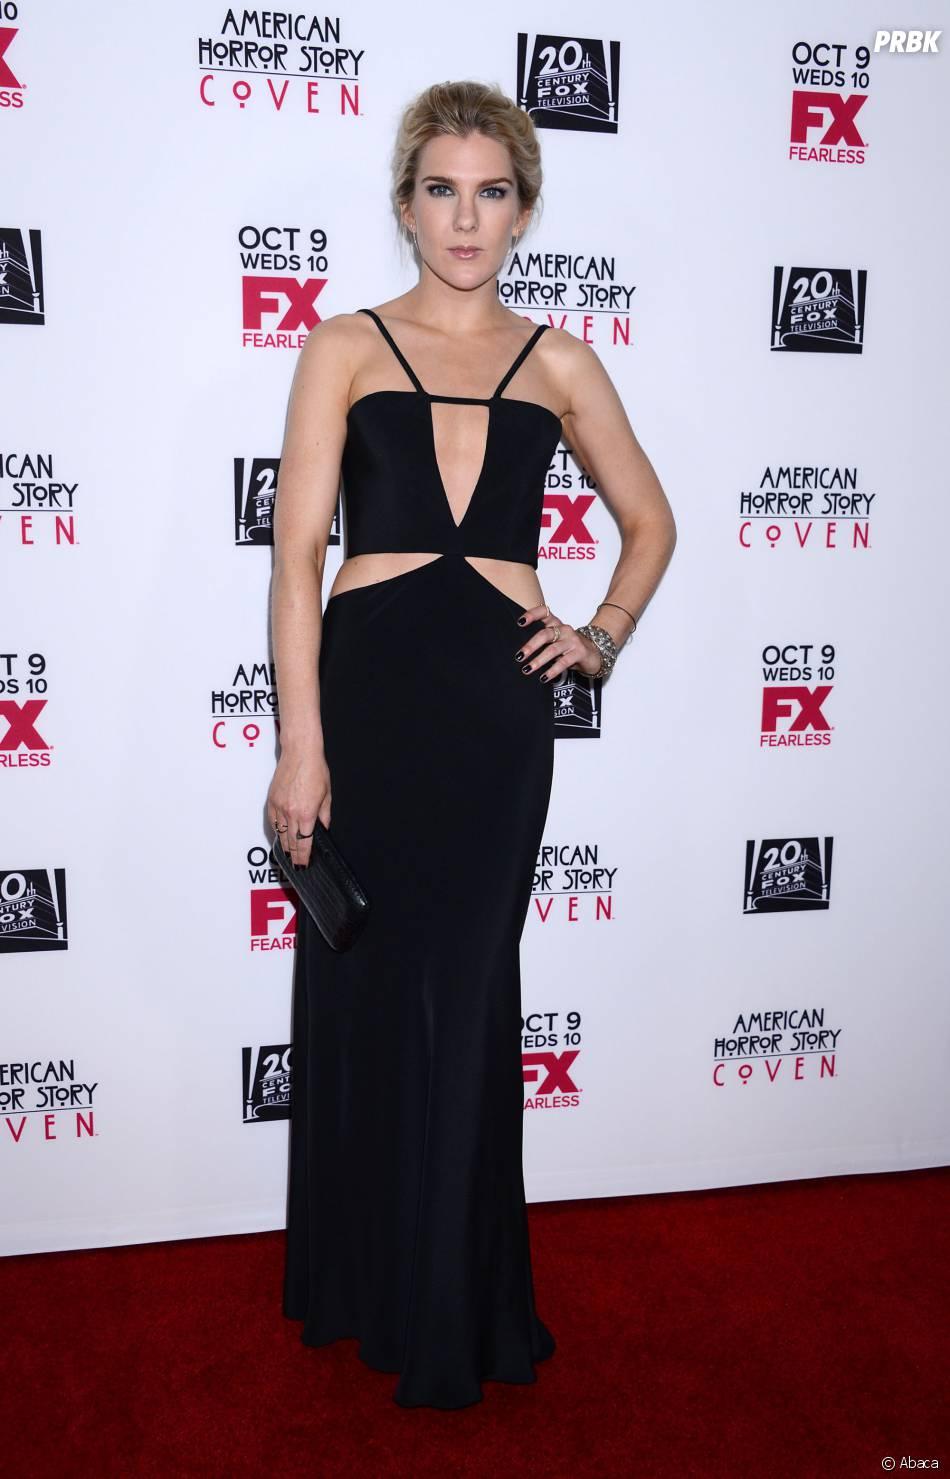 American Horror Story saison 4 :   Lily Rabe reprend son rôle d'Asylum